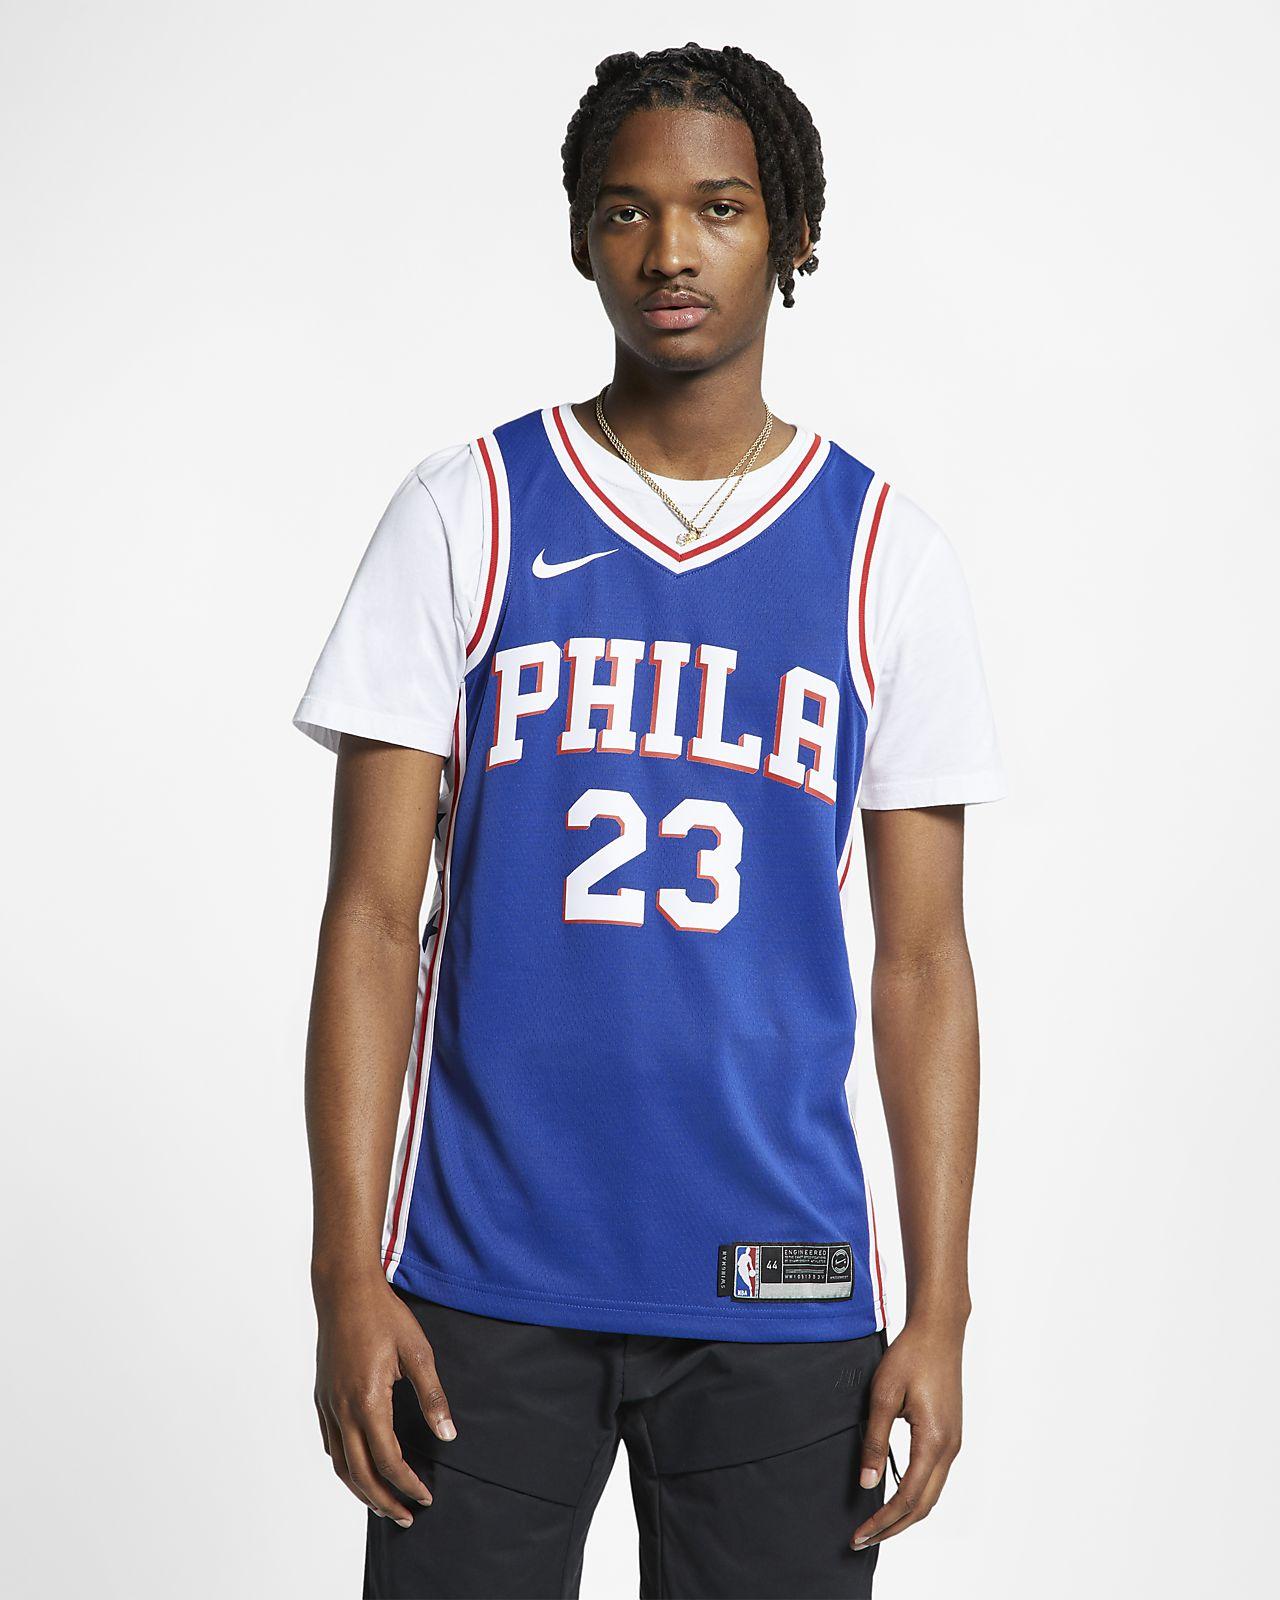 Maillot connecté Nike NBA Jimmy Butler Icon Edition Swingman (Philadelphia 76ers) pour Homme